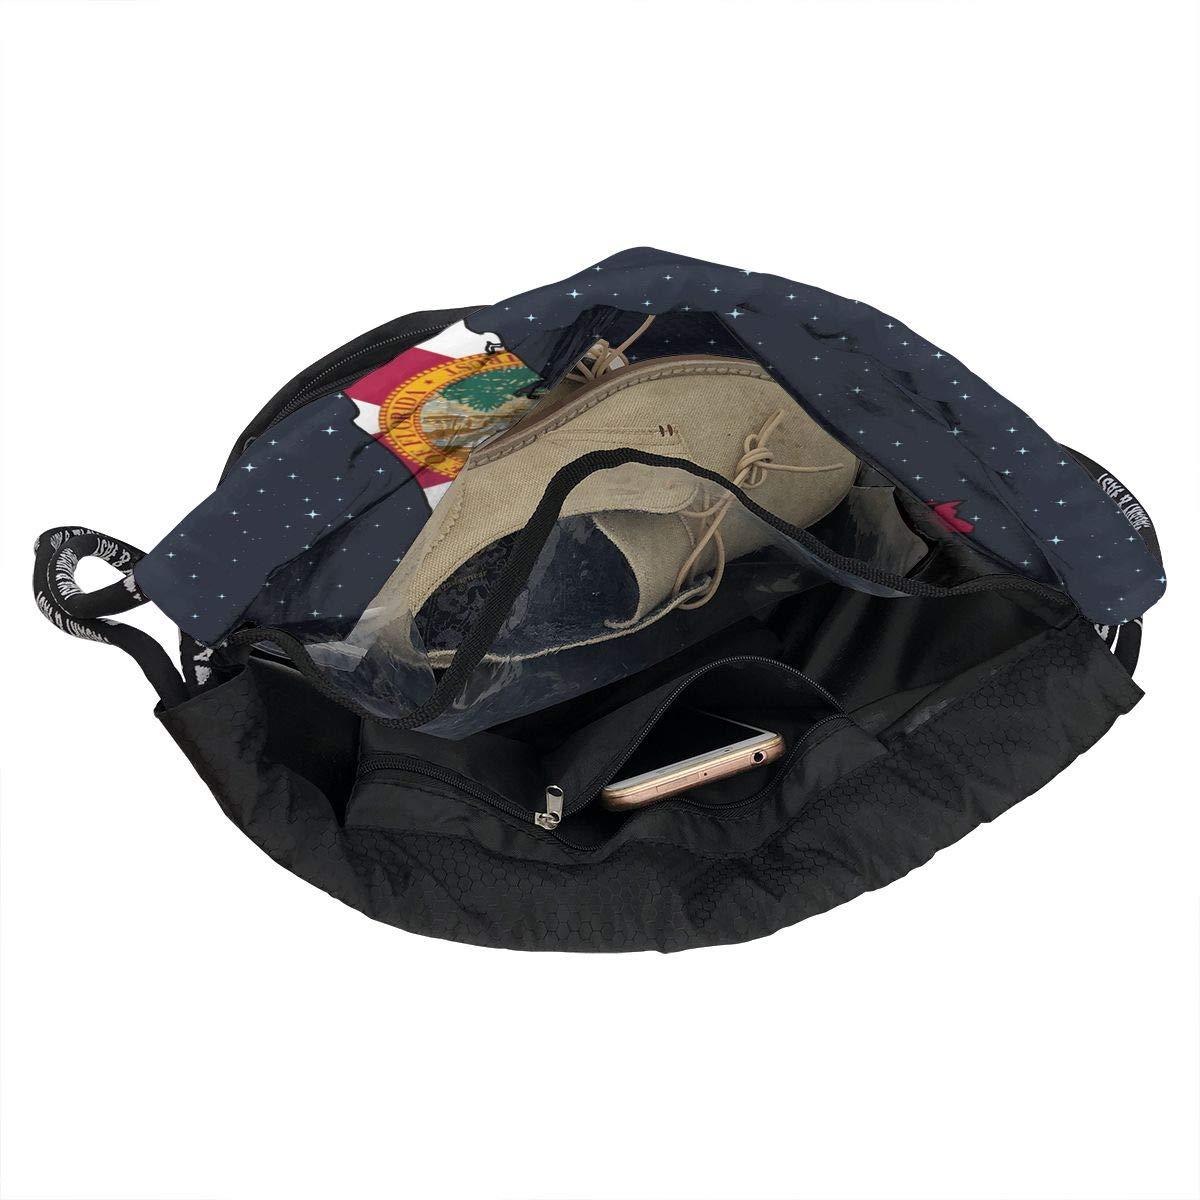 Abstract Florida State Map With Flag Drawstring Bag Multifunctional String Backpack Custom Cinch Backpack Rucksack Gym Bag